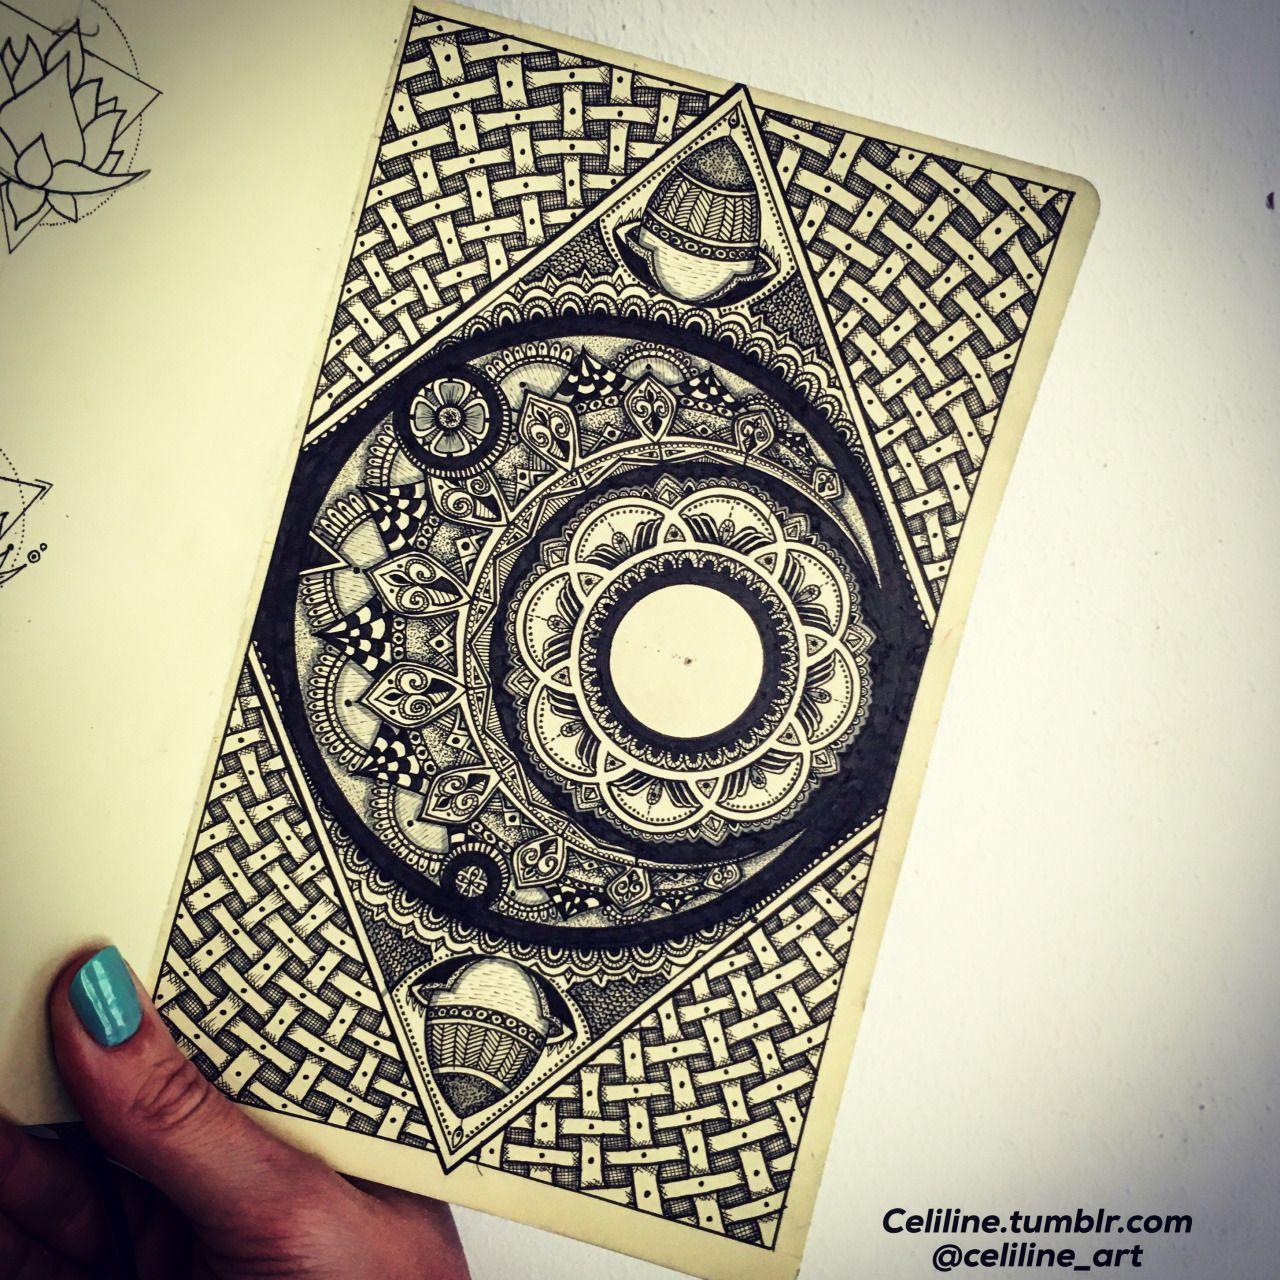 MOON IN A MOLESKINE - zentangle, Doodle, Artwork, drawing